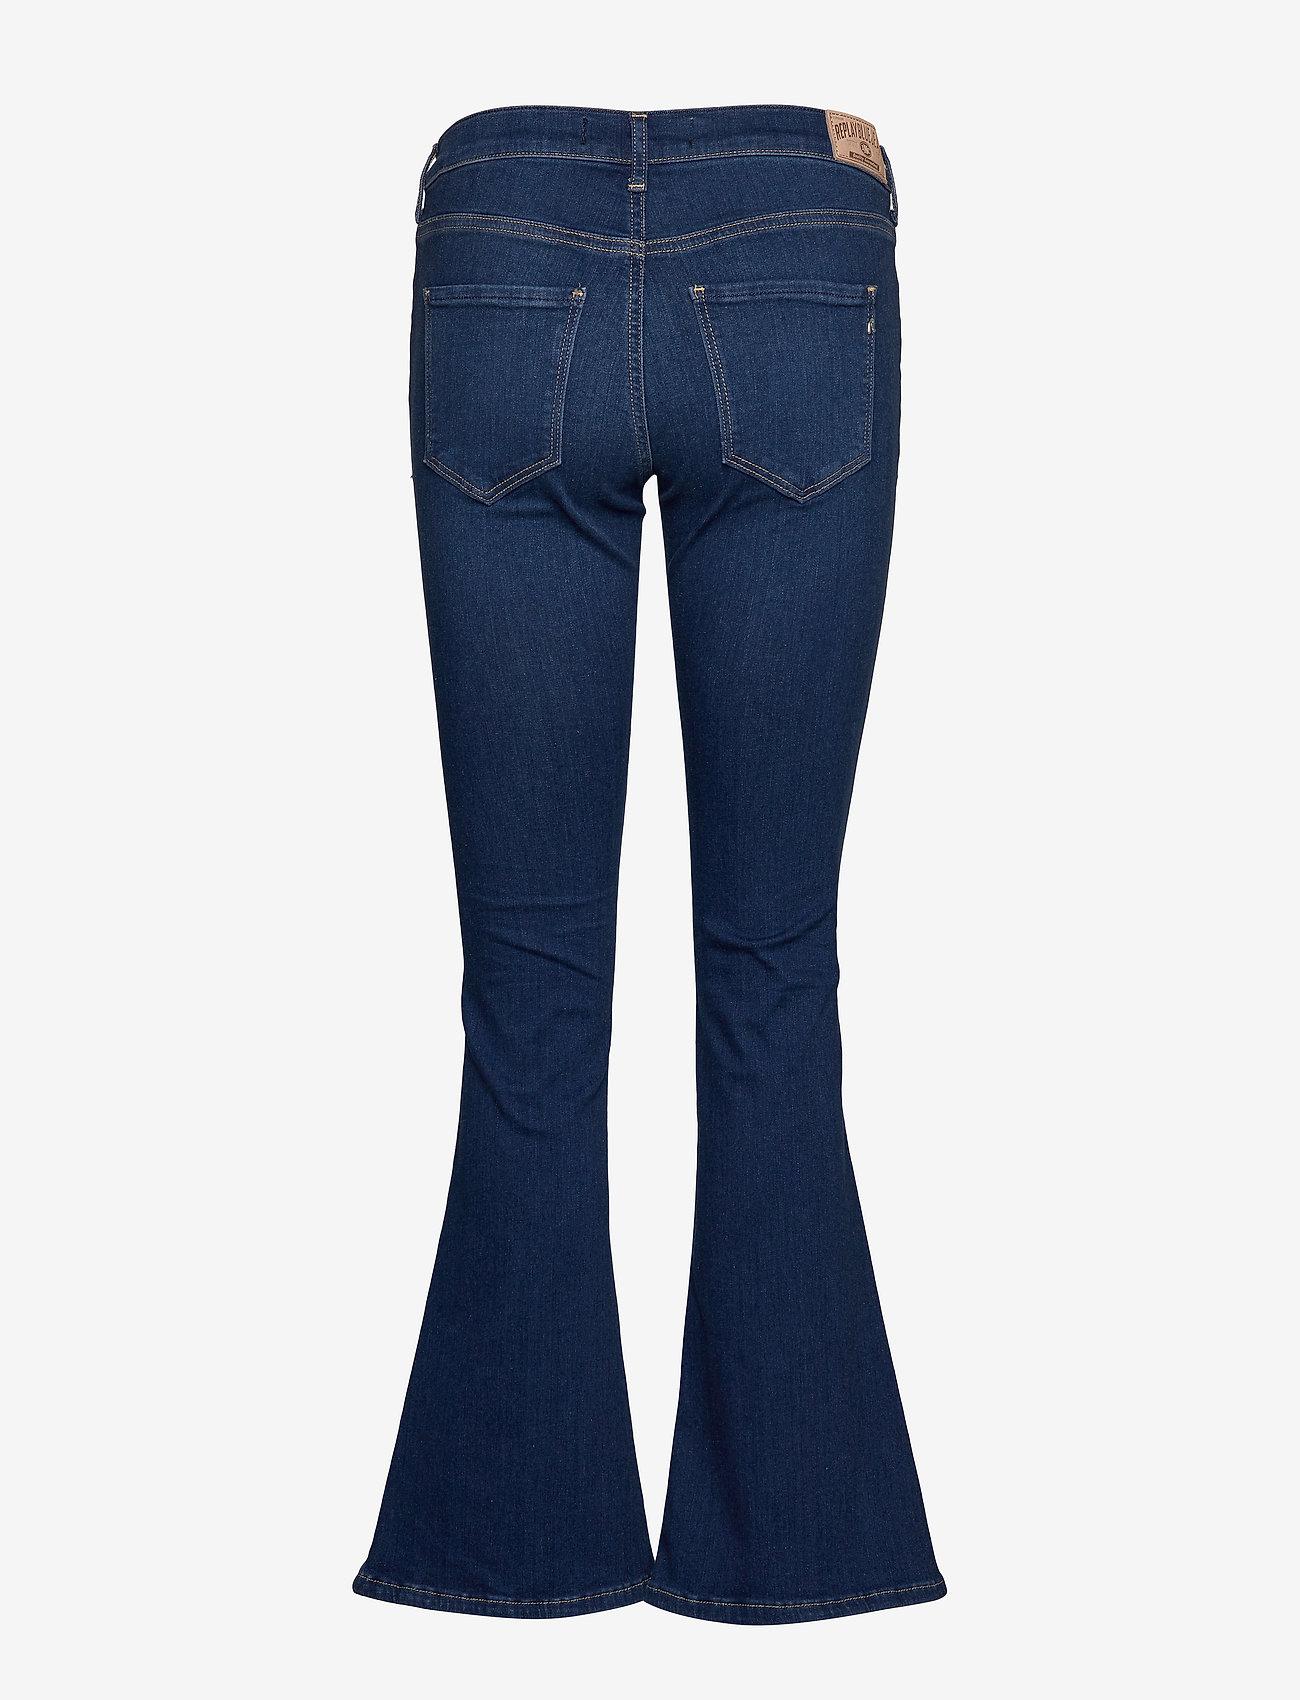 Replay - Shorts - schlaghosen - medium blue - 1